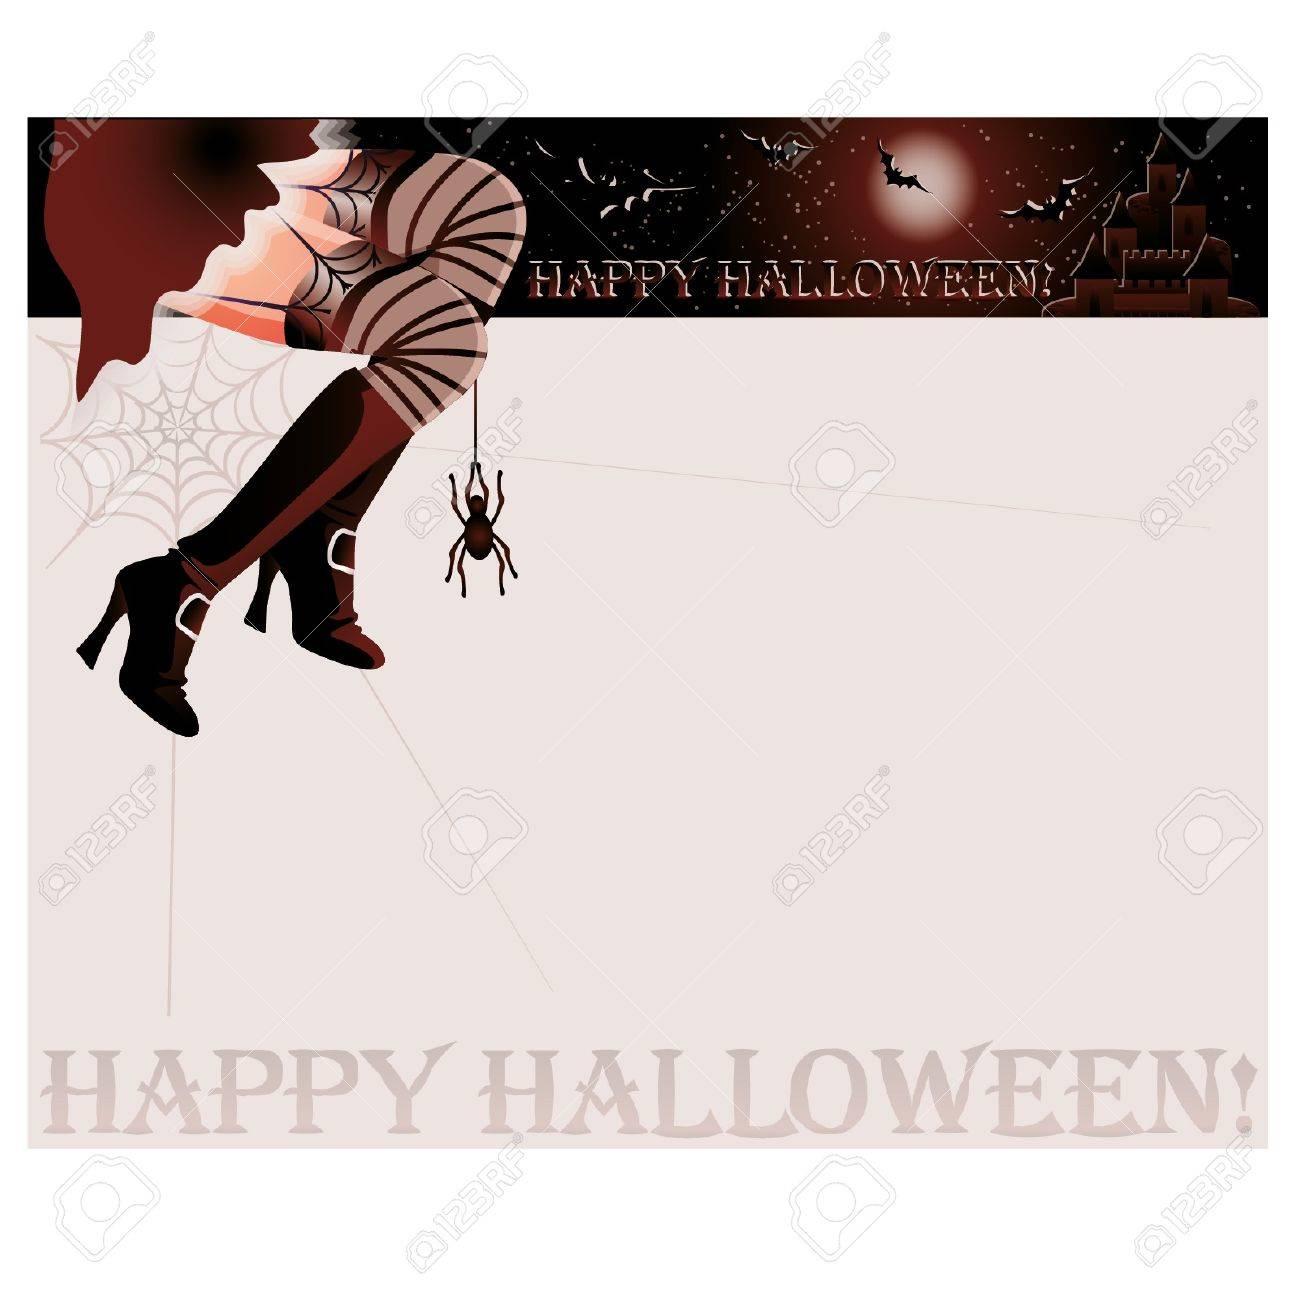 Happy halloween magic card,  illustration Stock Vector - 14991579